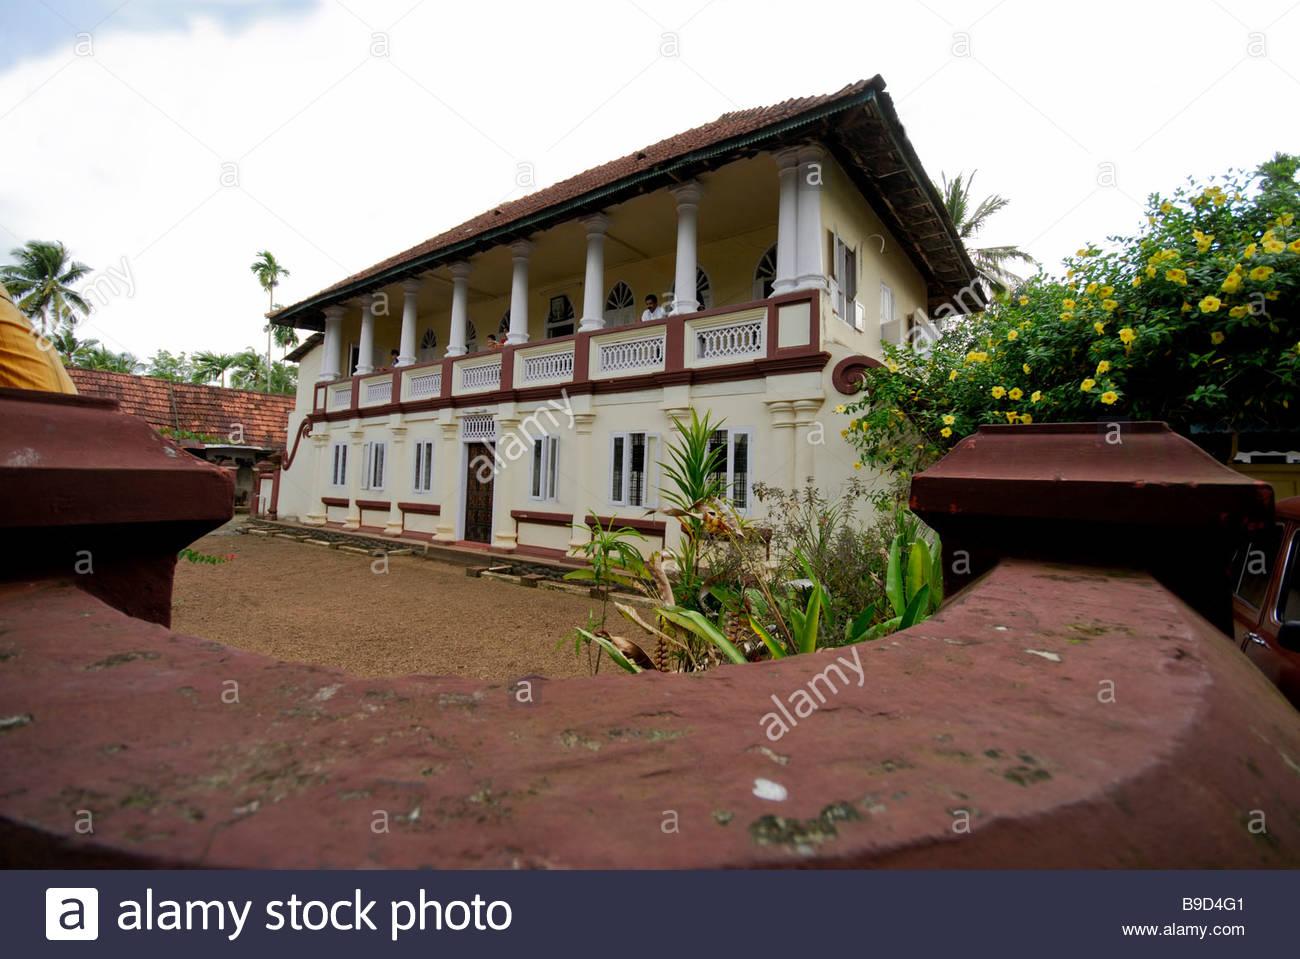 OLD HOUSE IN CHAMPAKKULAM, ALAPPUZHA, KERALA   Stock Image